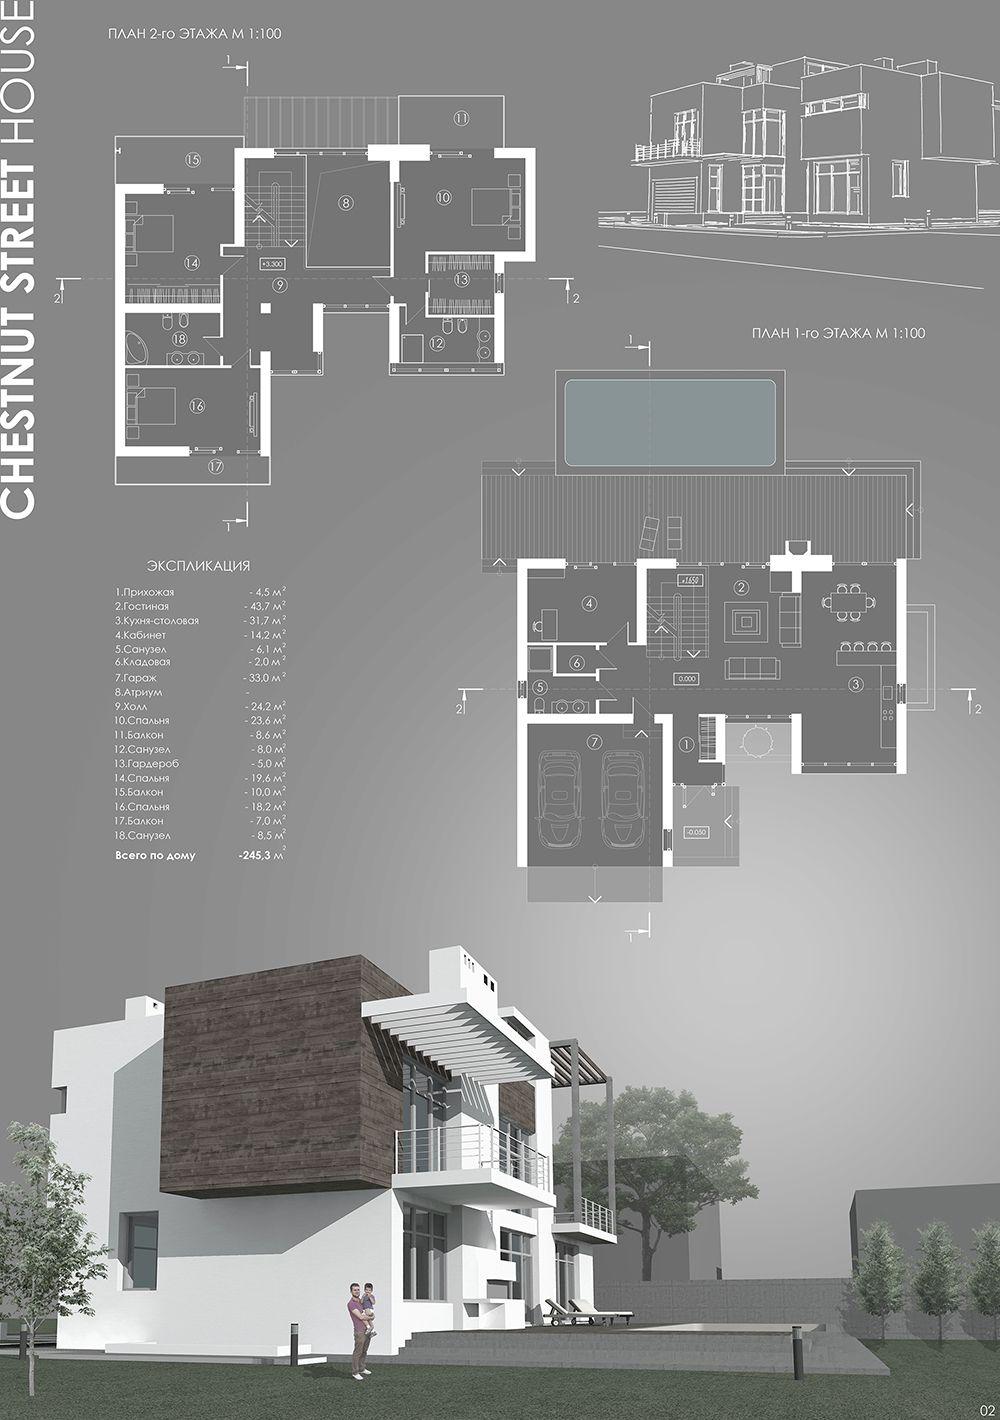 Chestnut Street House | PostScriptum | Architettura | Pinterest ...